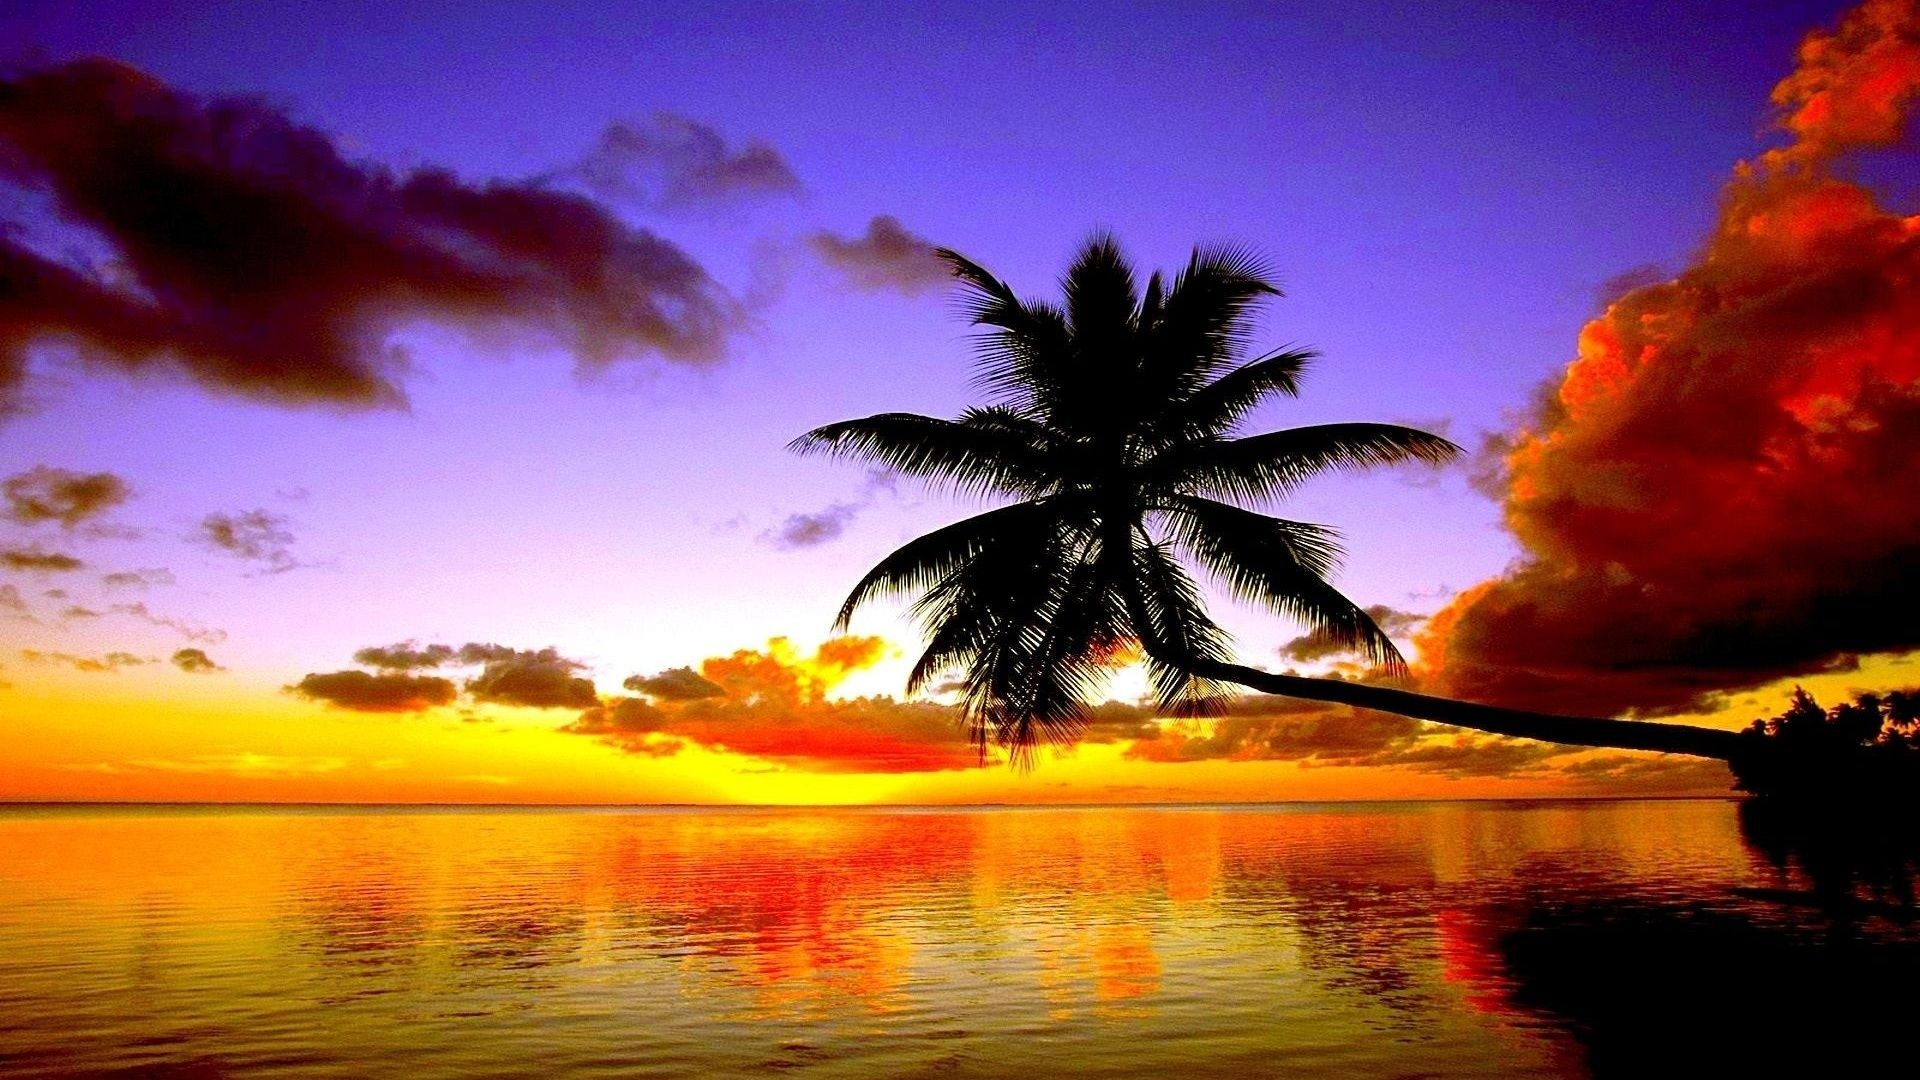 Palm Tree Sunset image